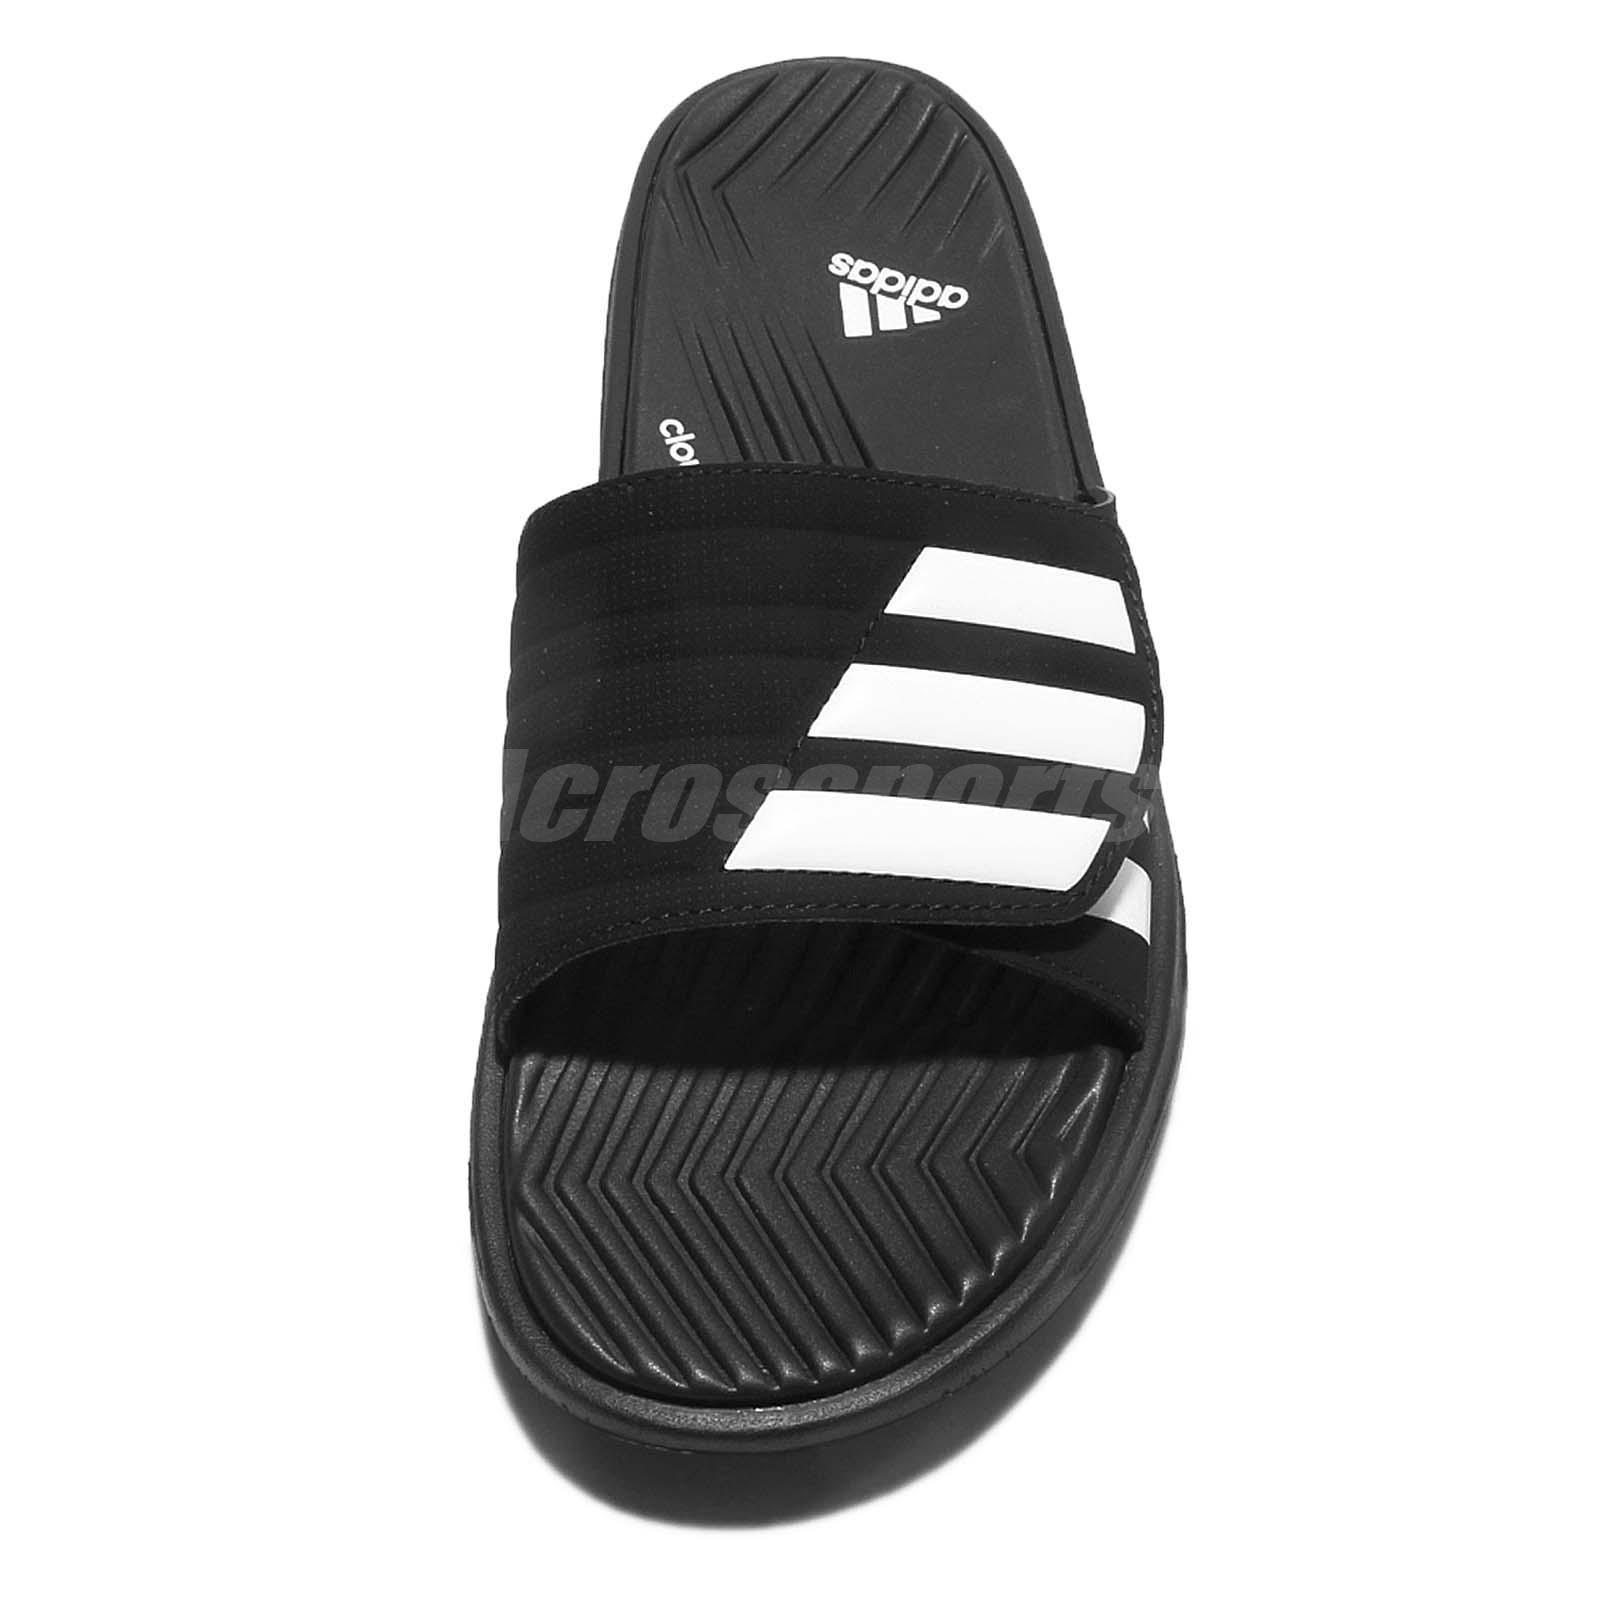 549af54f7775 2018 adidas Izamo CF Black White Men Sandal Slides Slippers S77989 ...